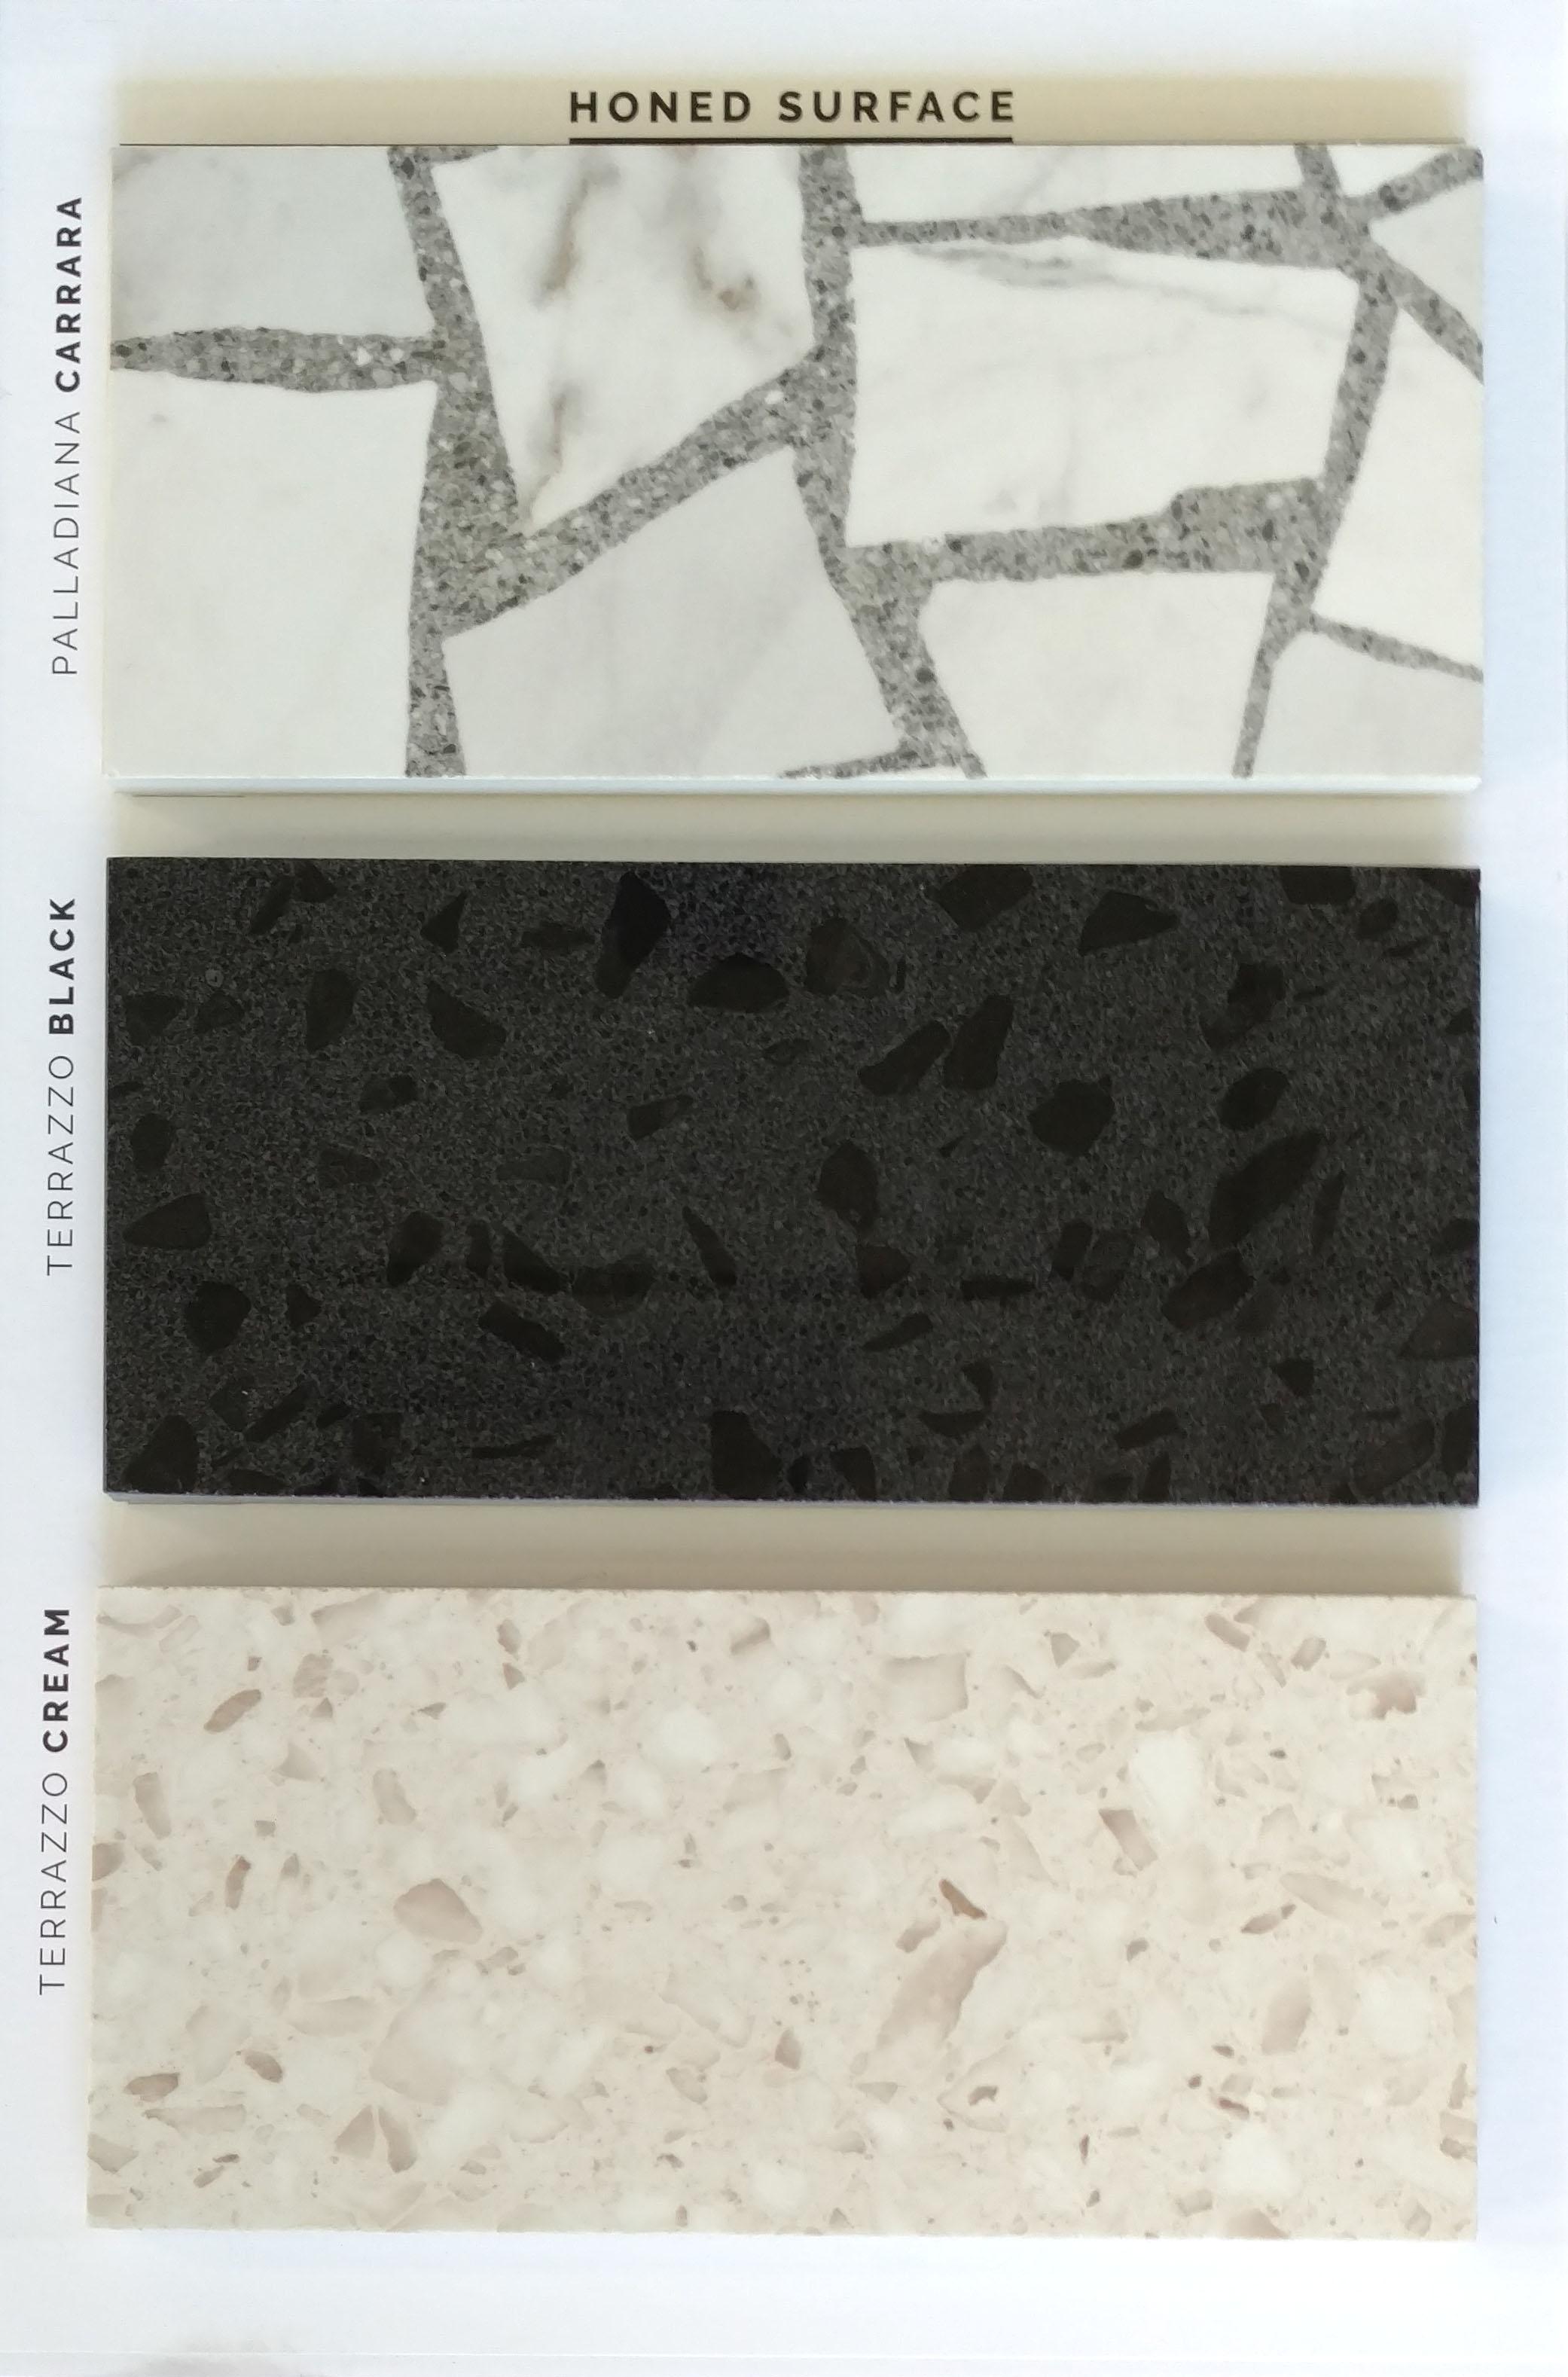 "HONED (Polished)24""x24""    Carrara / Black / Cream  3 PC/CTN (11.63 SF); 40 CTN/PLT  Special order sizes: 12""x24"" / 18""x36"" / 30""x30"" / 30""x60"""